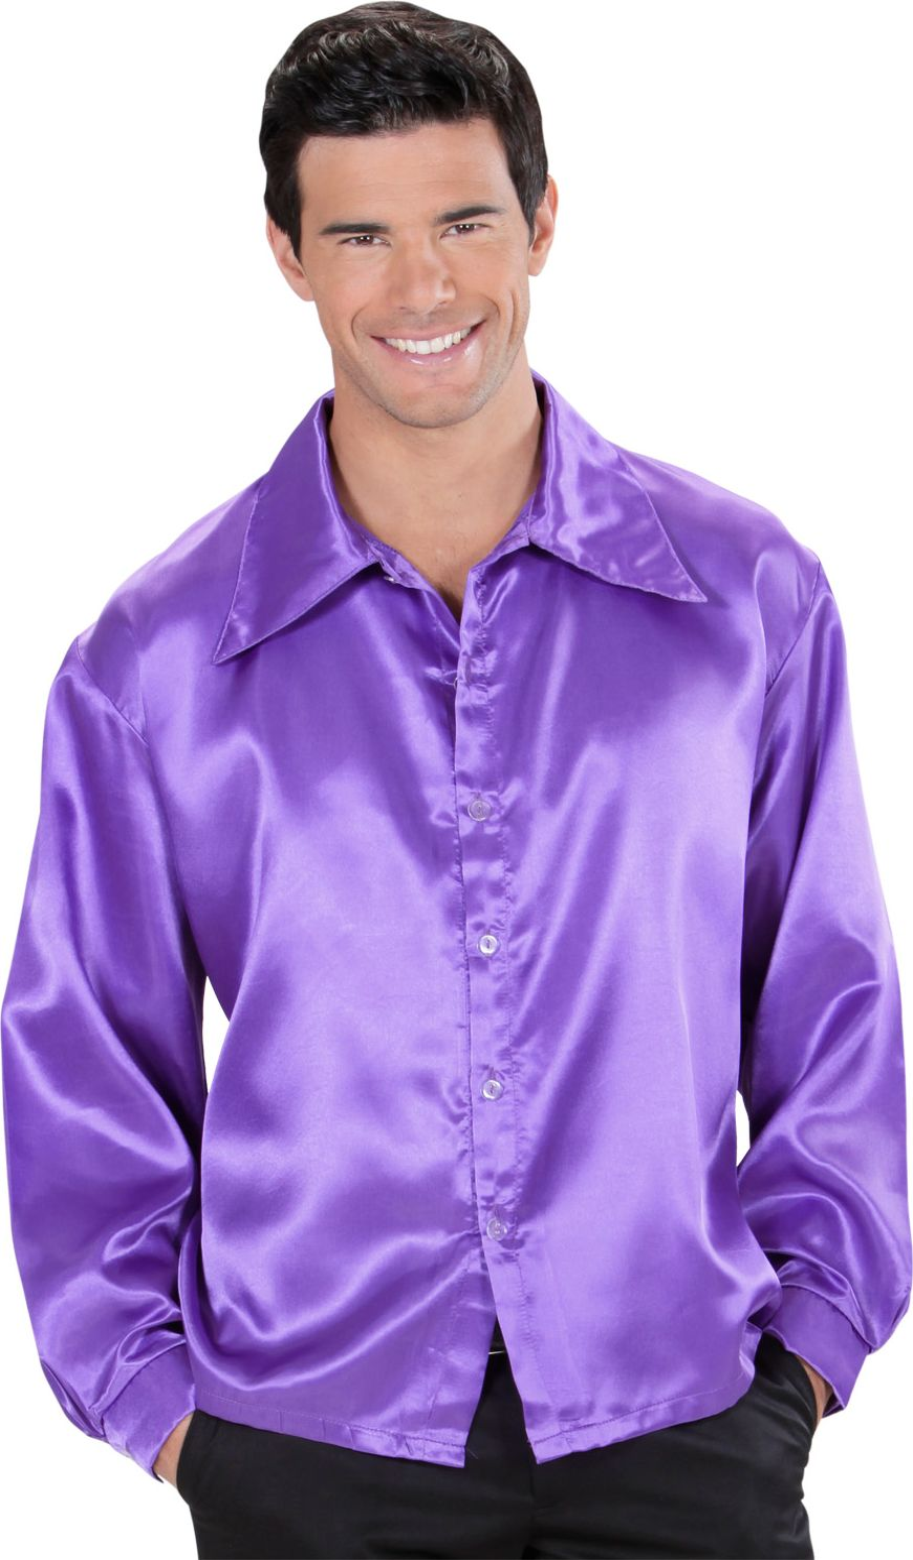 Jaren 70 disco shirt, paars